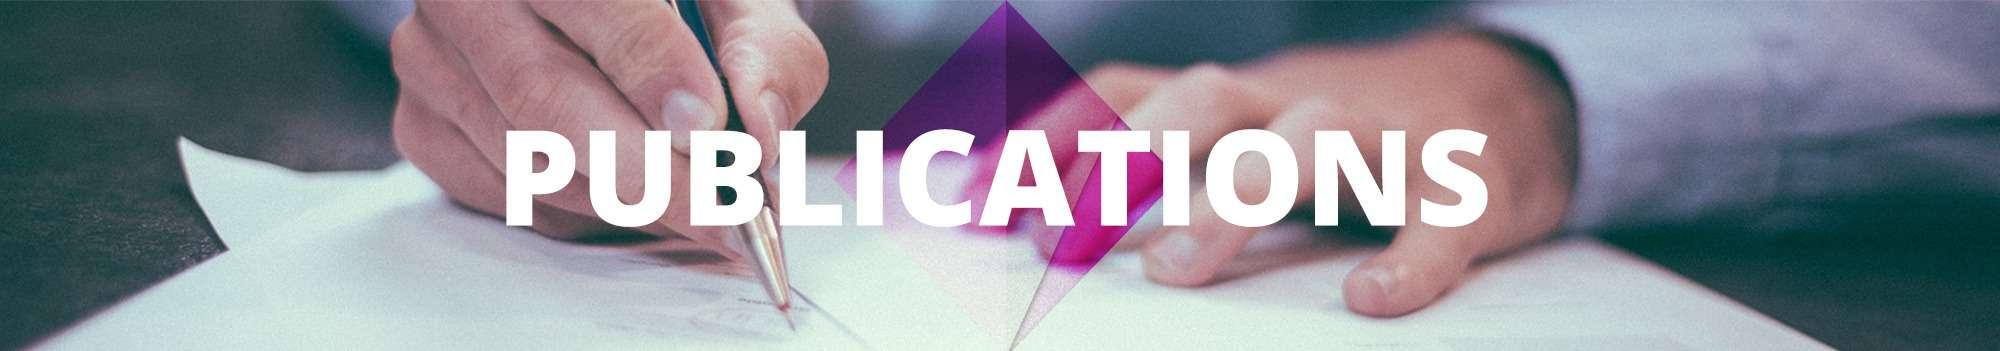 Publications of Relyon Plasma GmbH